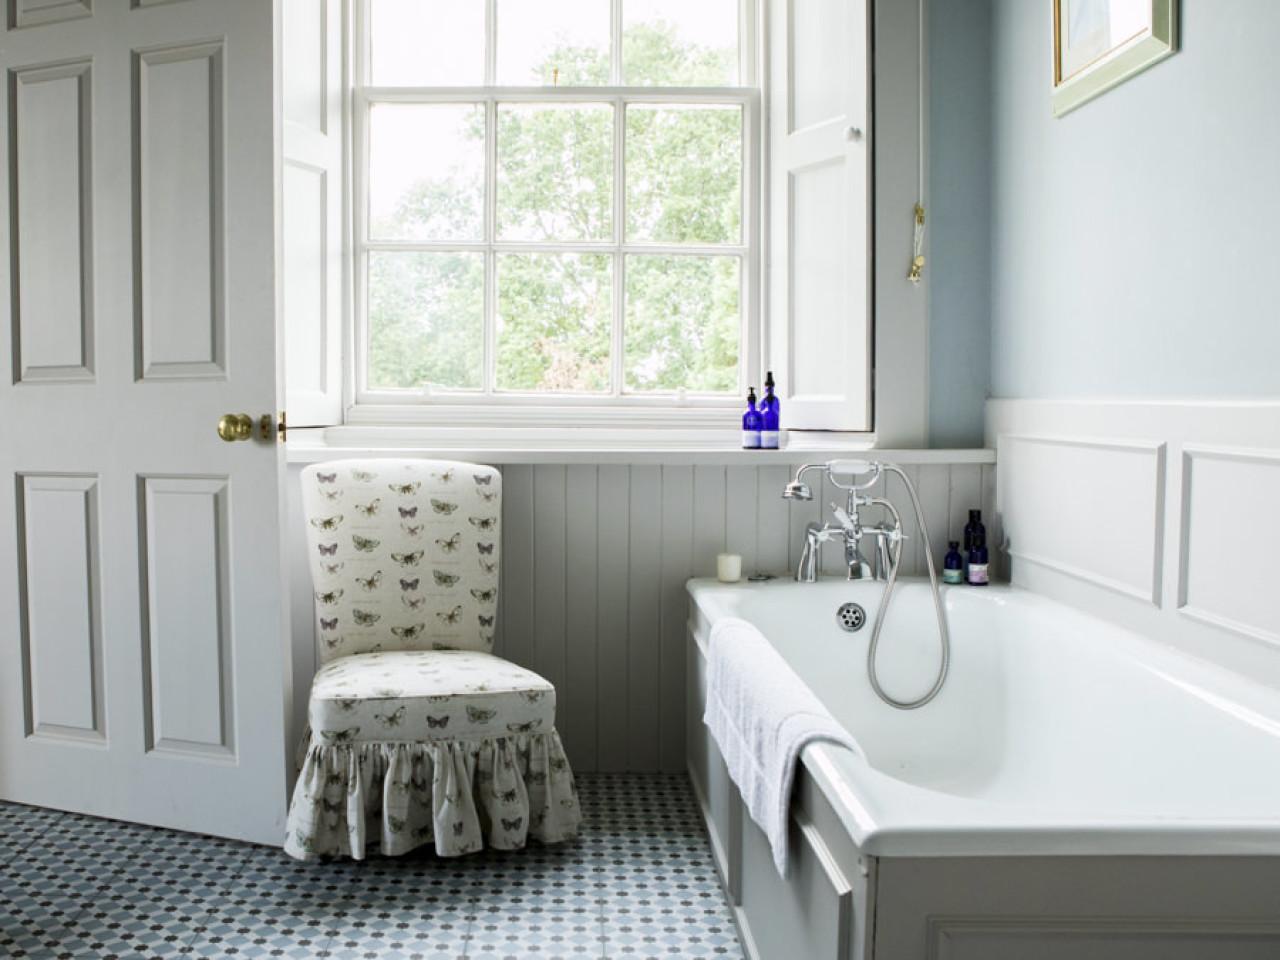 The Tay View - bathroom